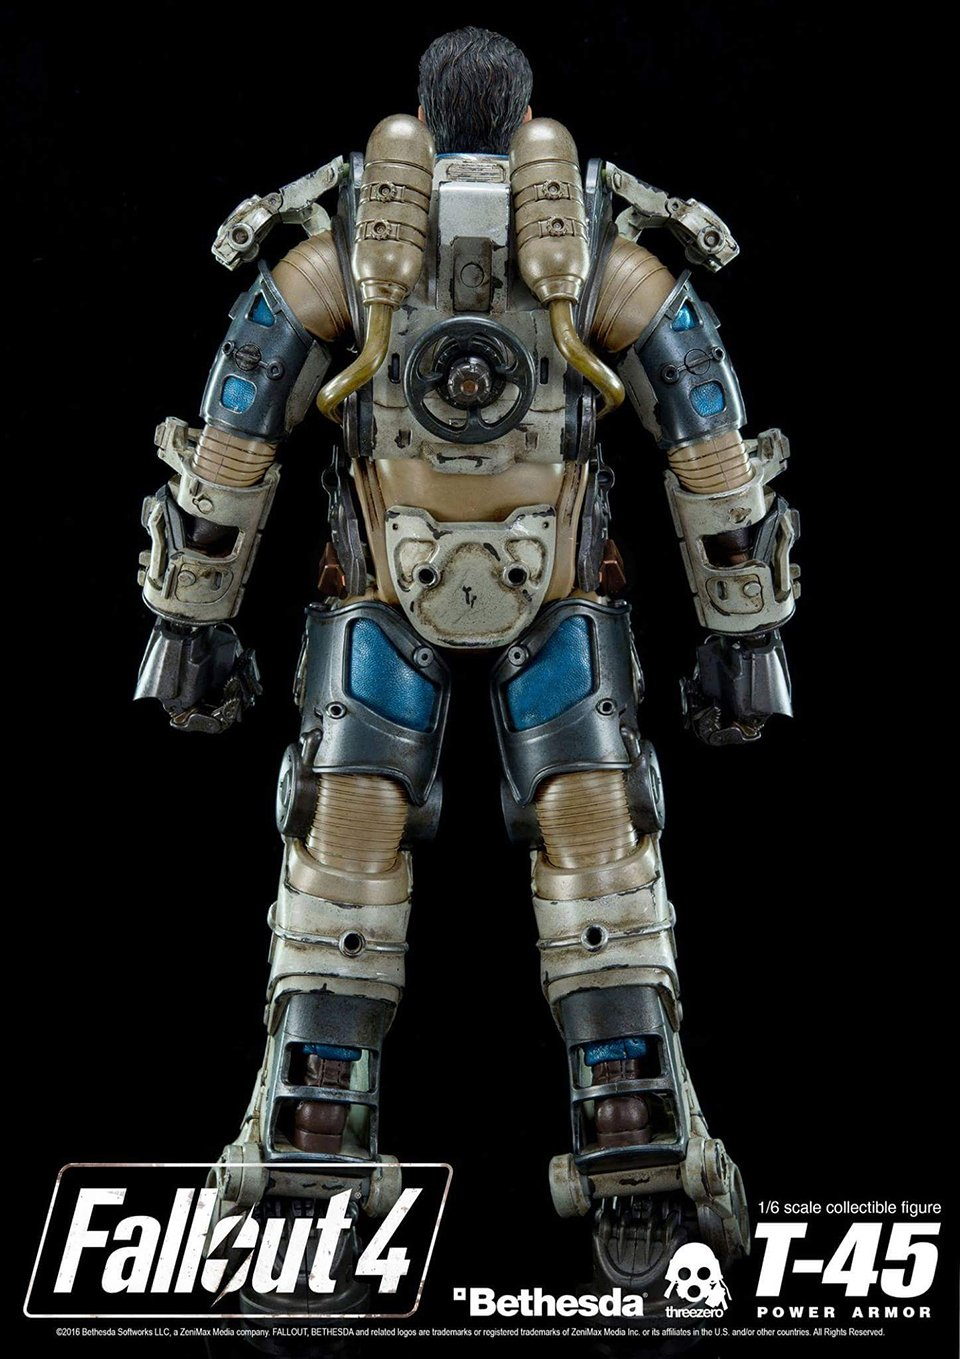 Fallout 4 T-45 Action Figure